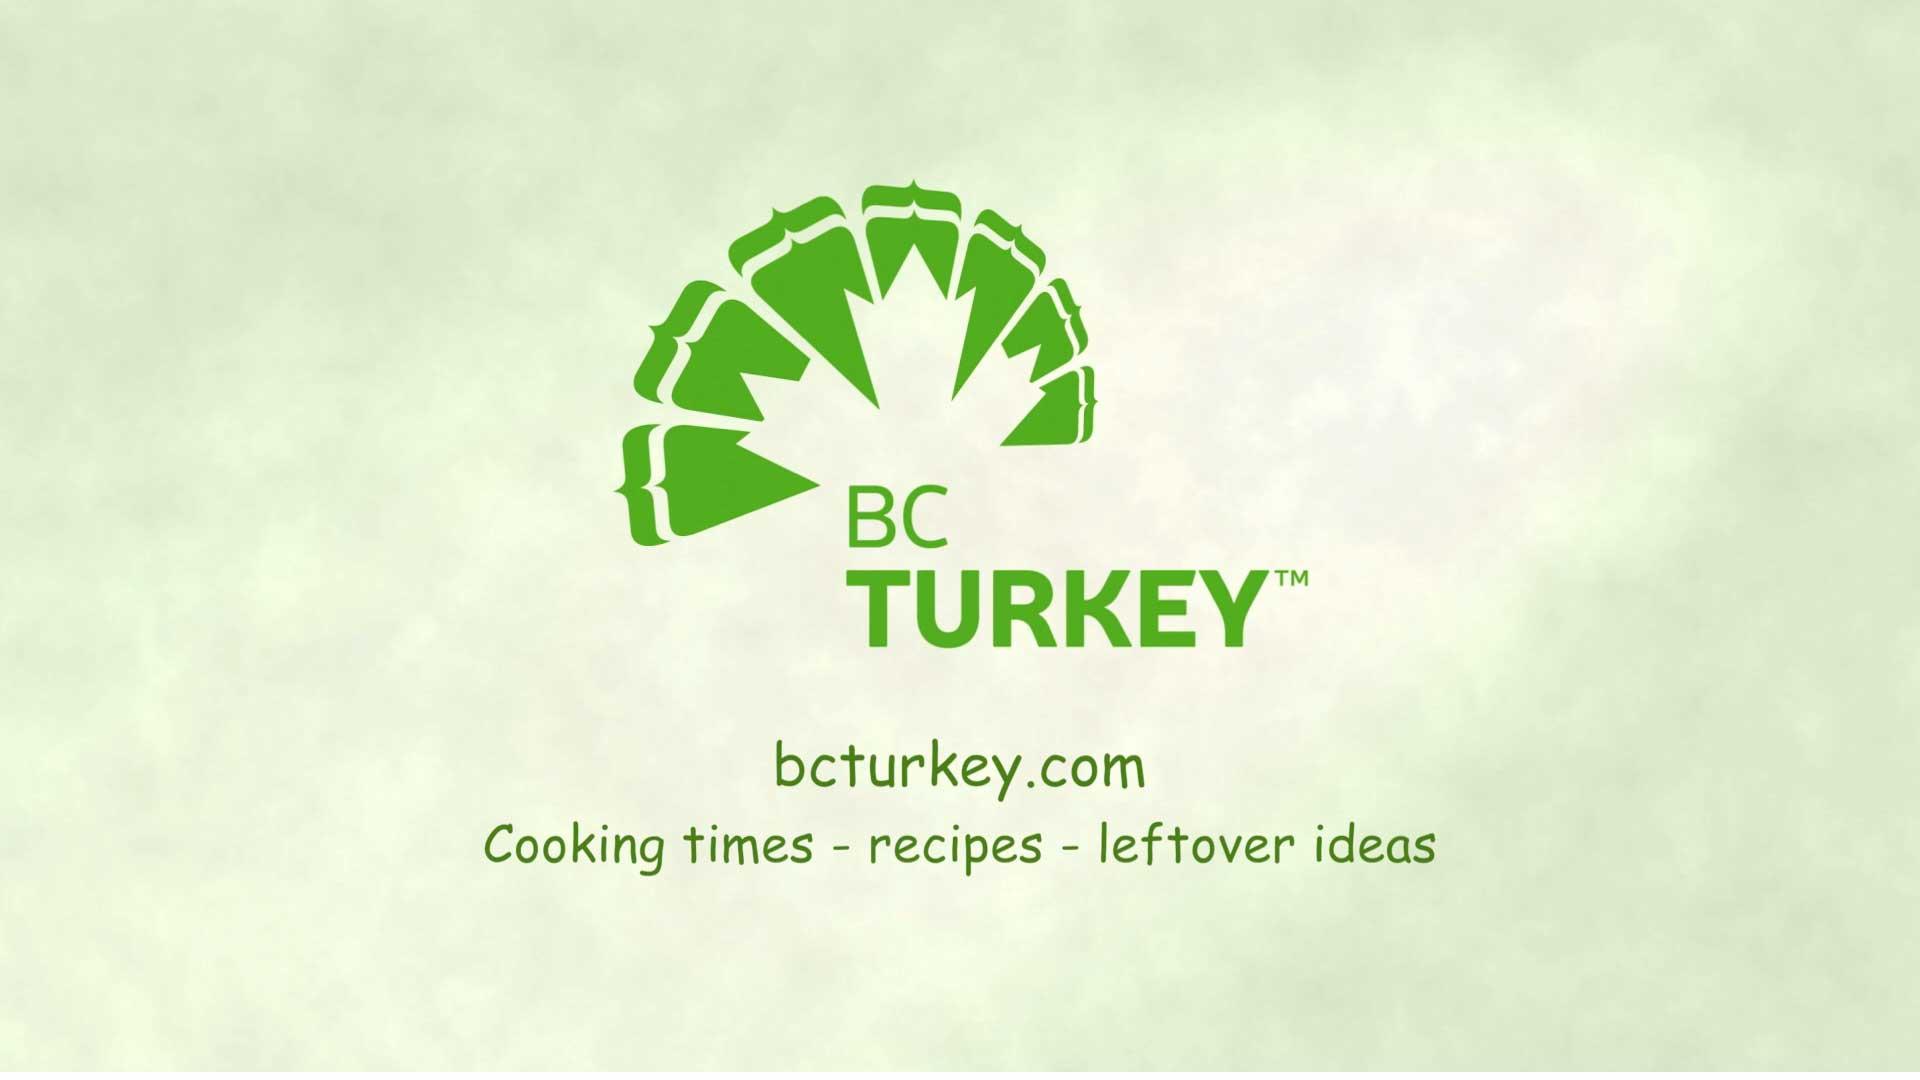 BC Turkey end tag graphic